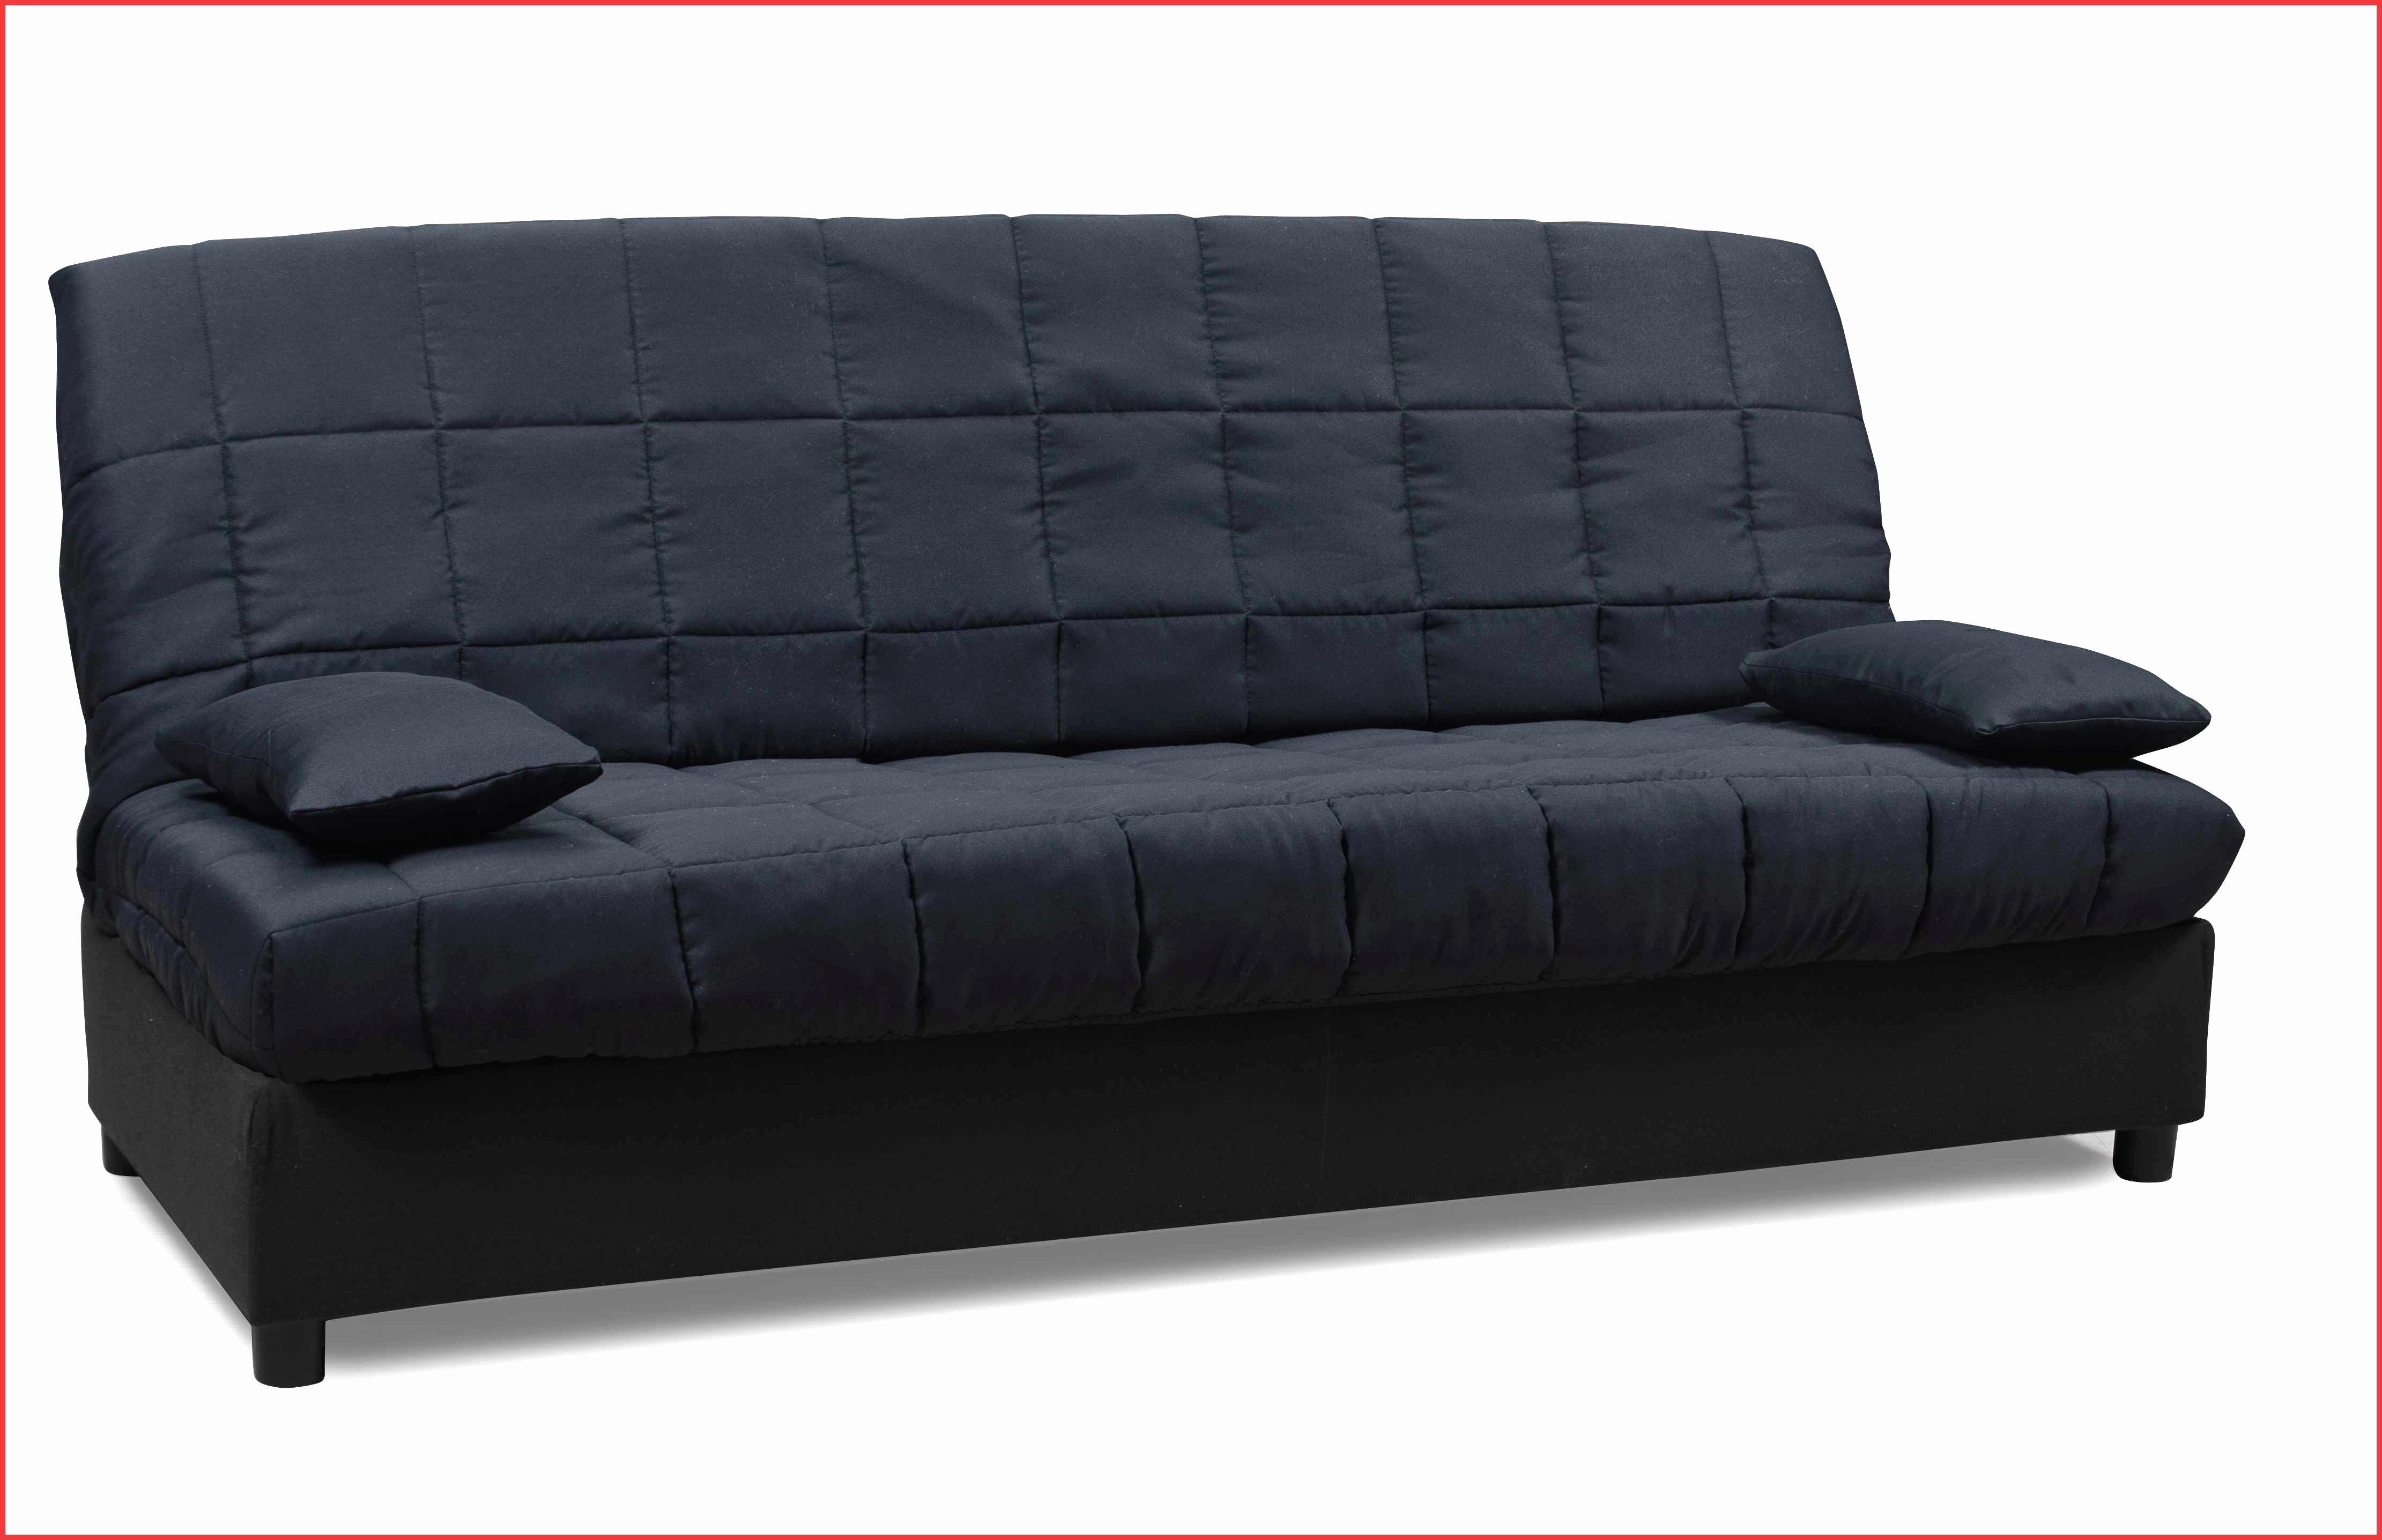 Canape solde Ikea Beau Photos Clic Clac Ou Bz Pas Cher Radioconexionanimal